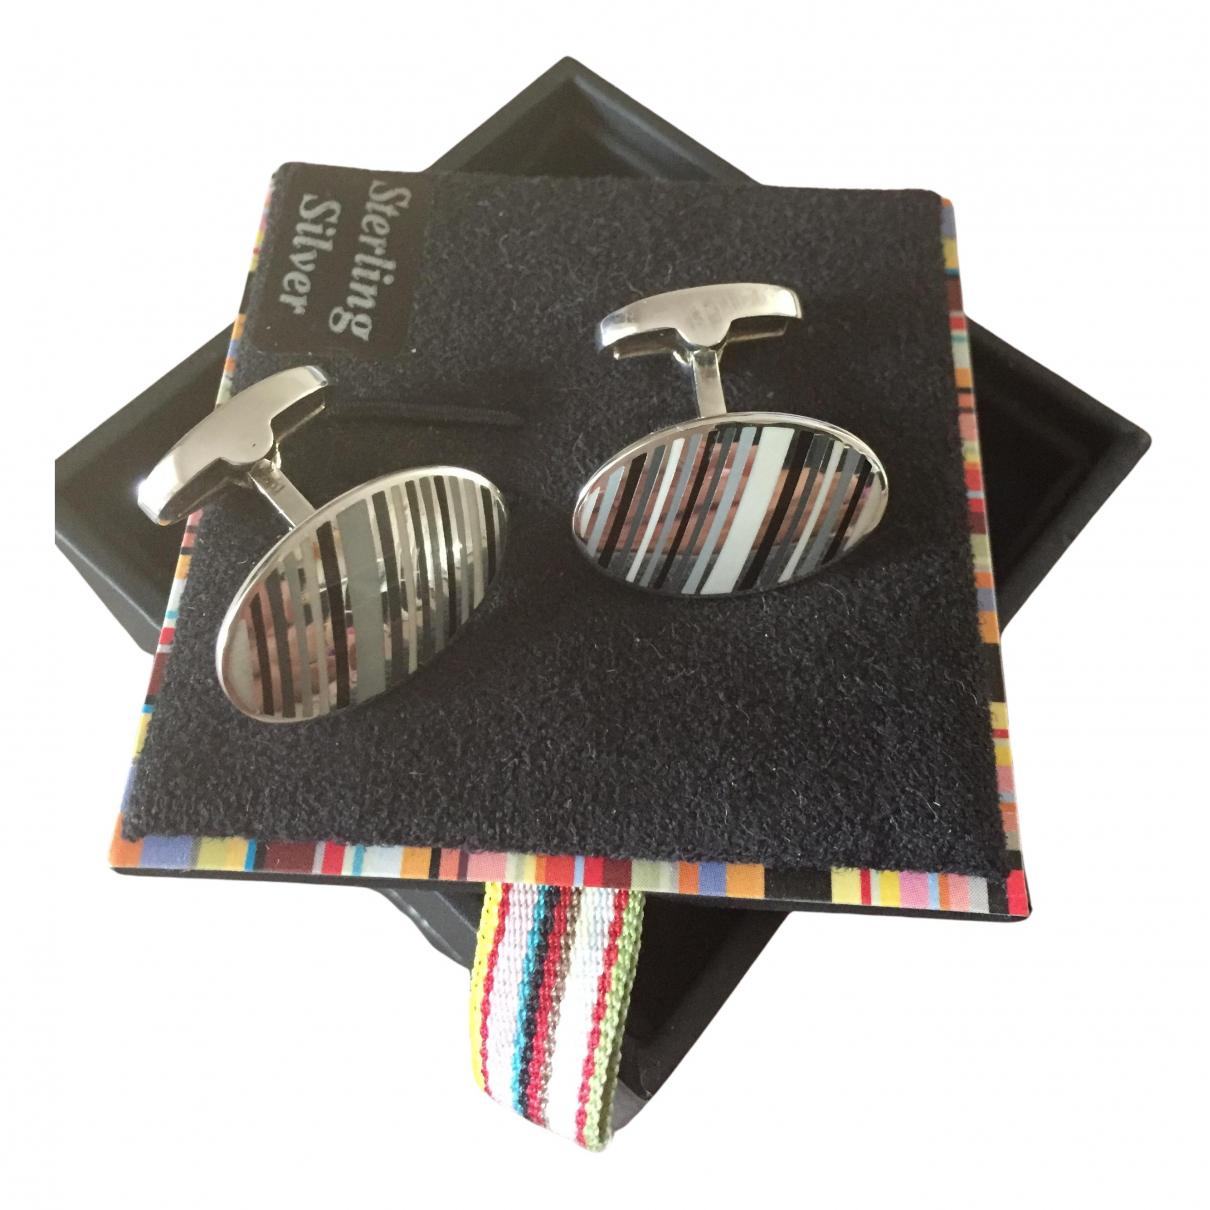 Paul Smith N Silver Silver Cufflinks for Men N